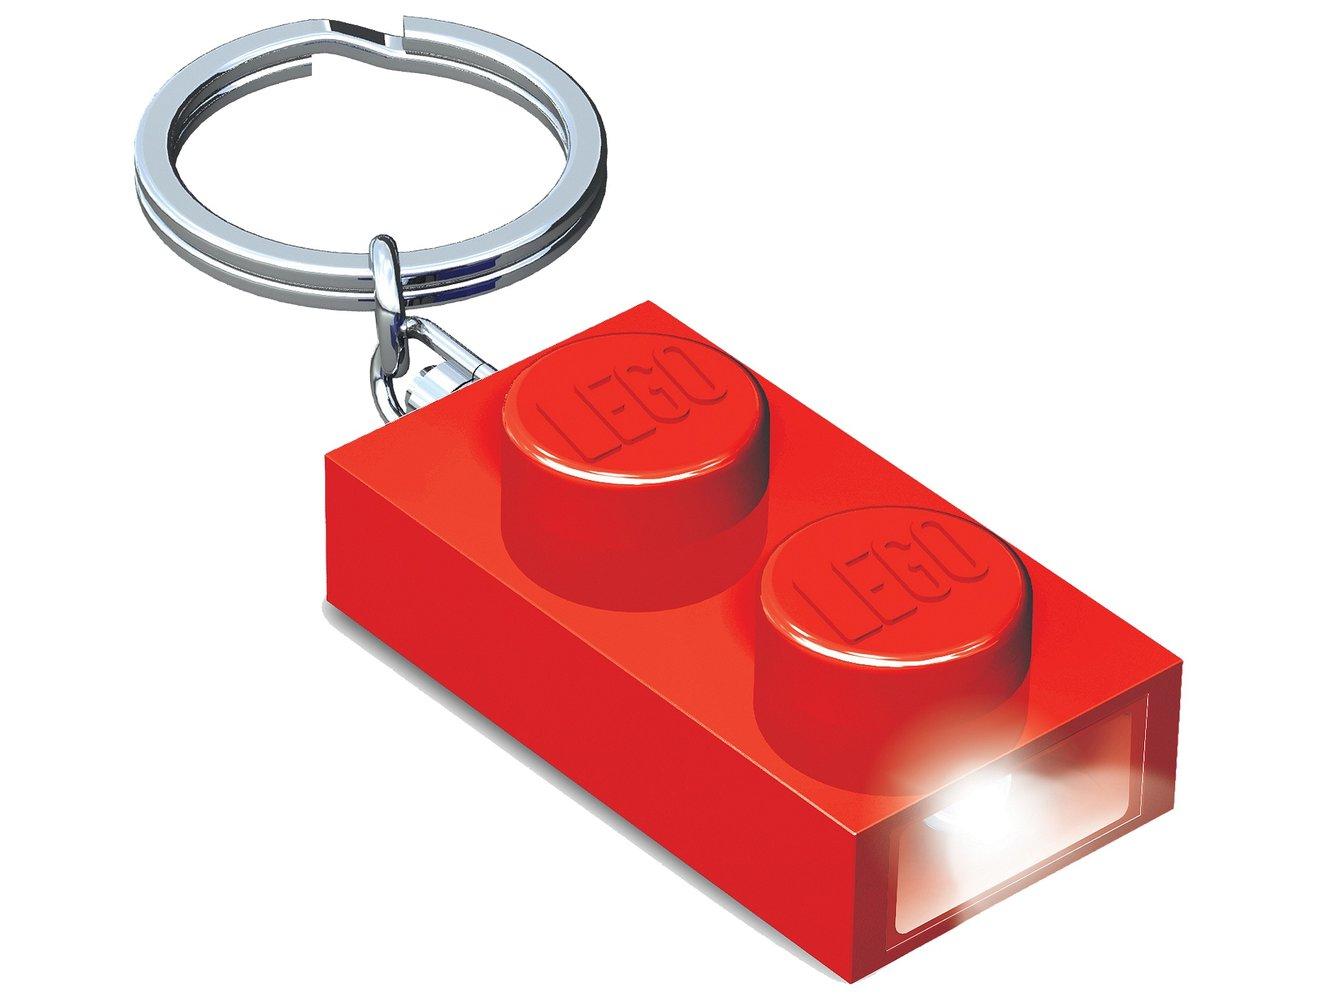 1x2 Brick Key Light (Red)